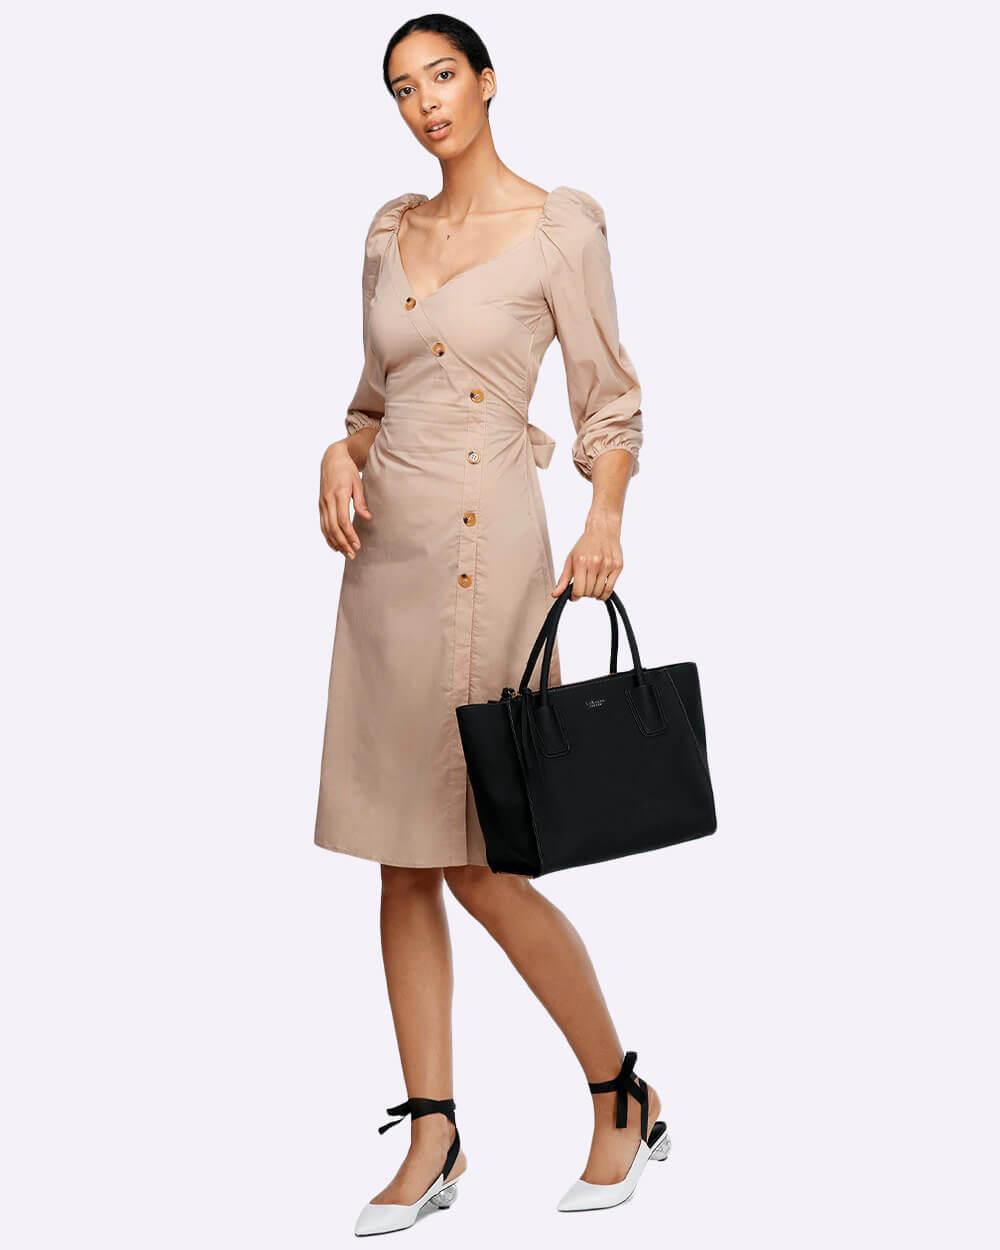 LaBante vegan handbag black